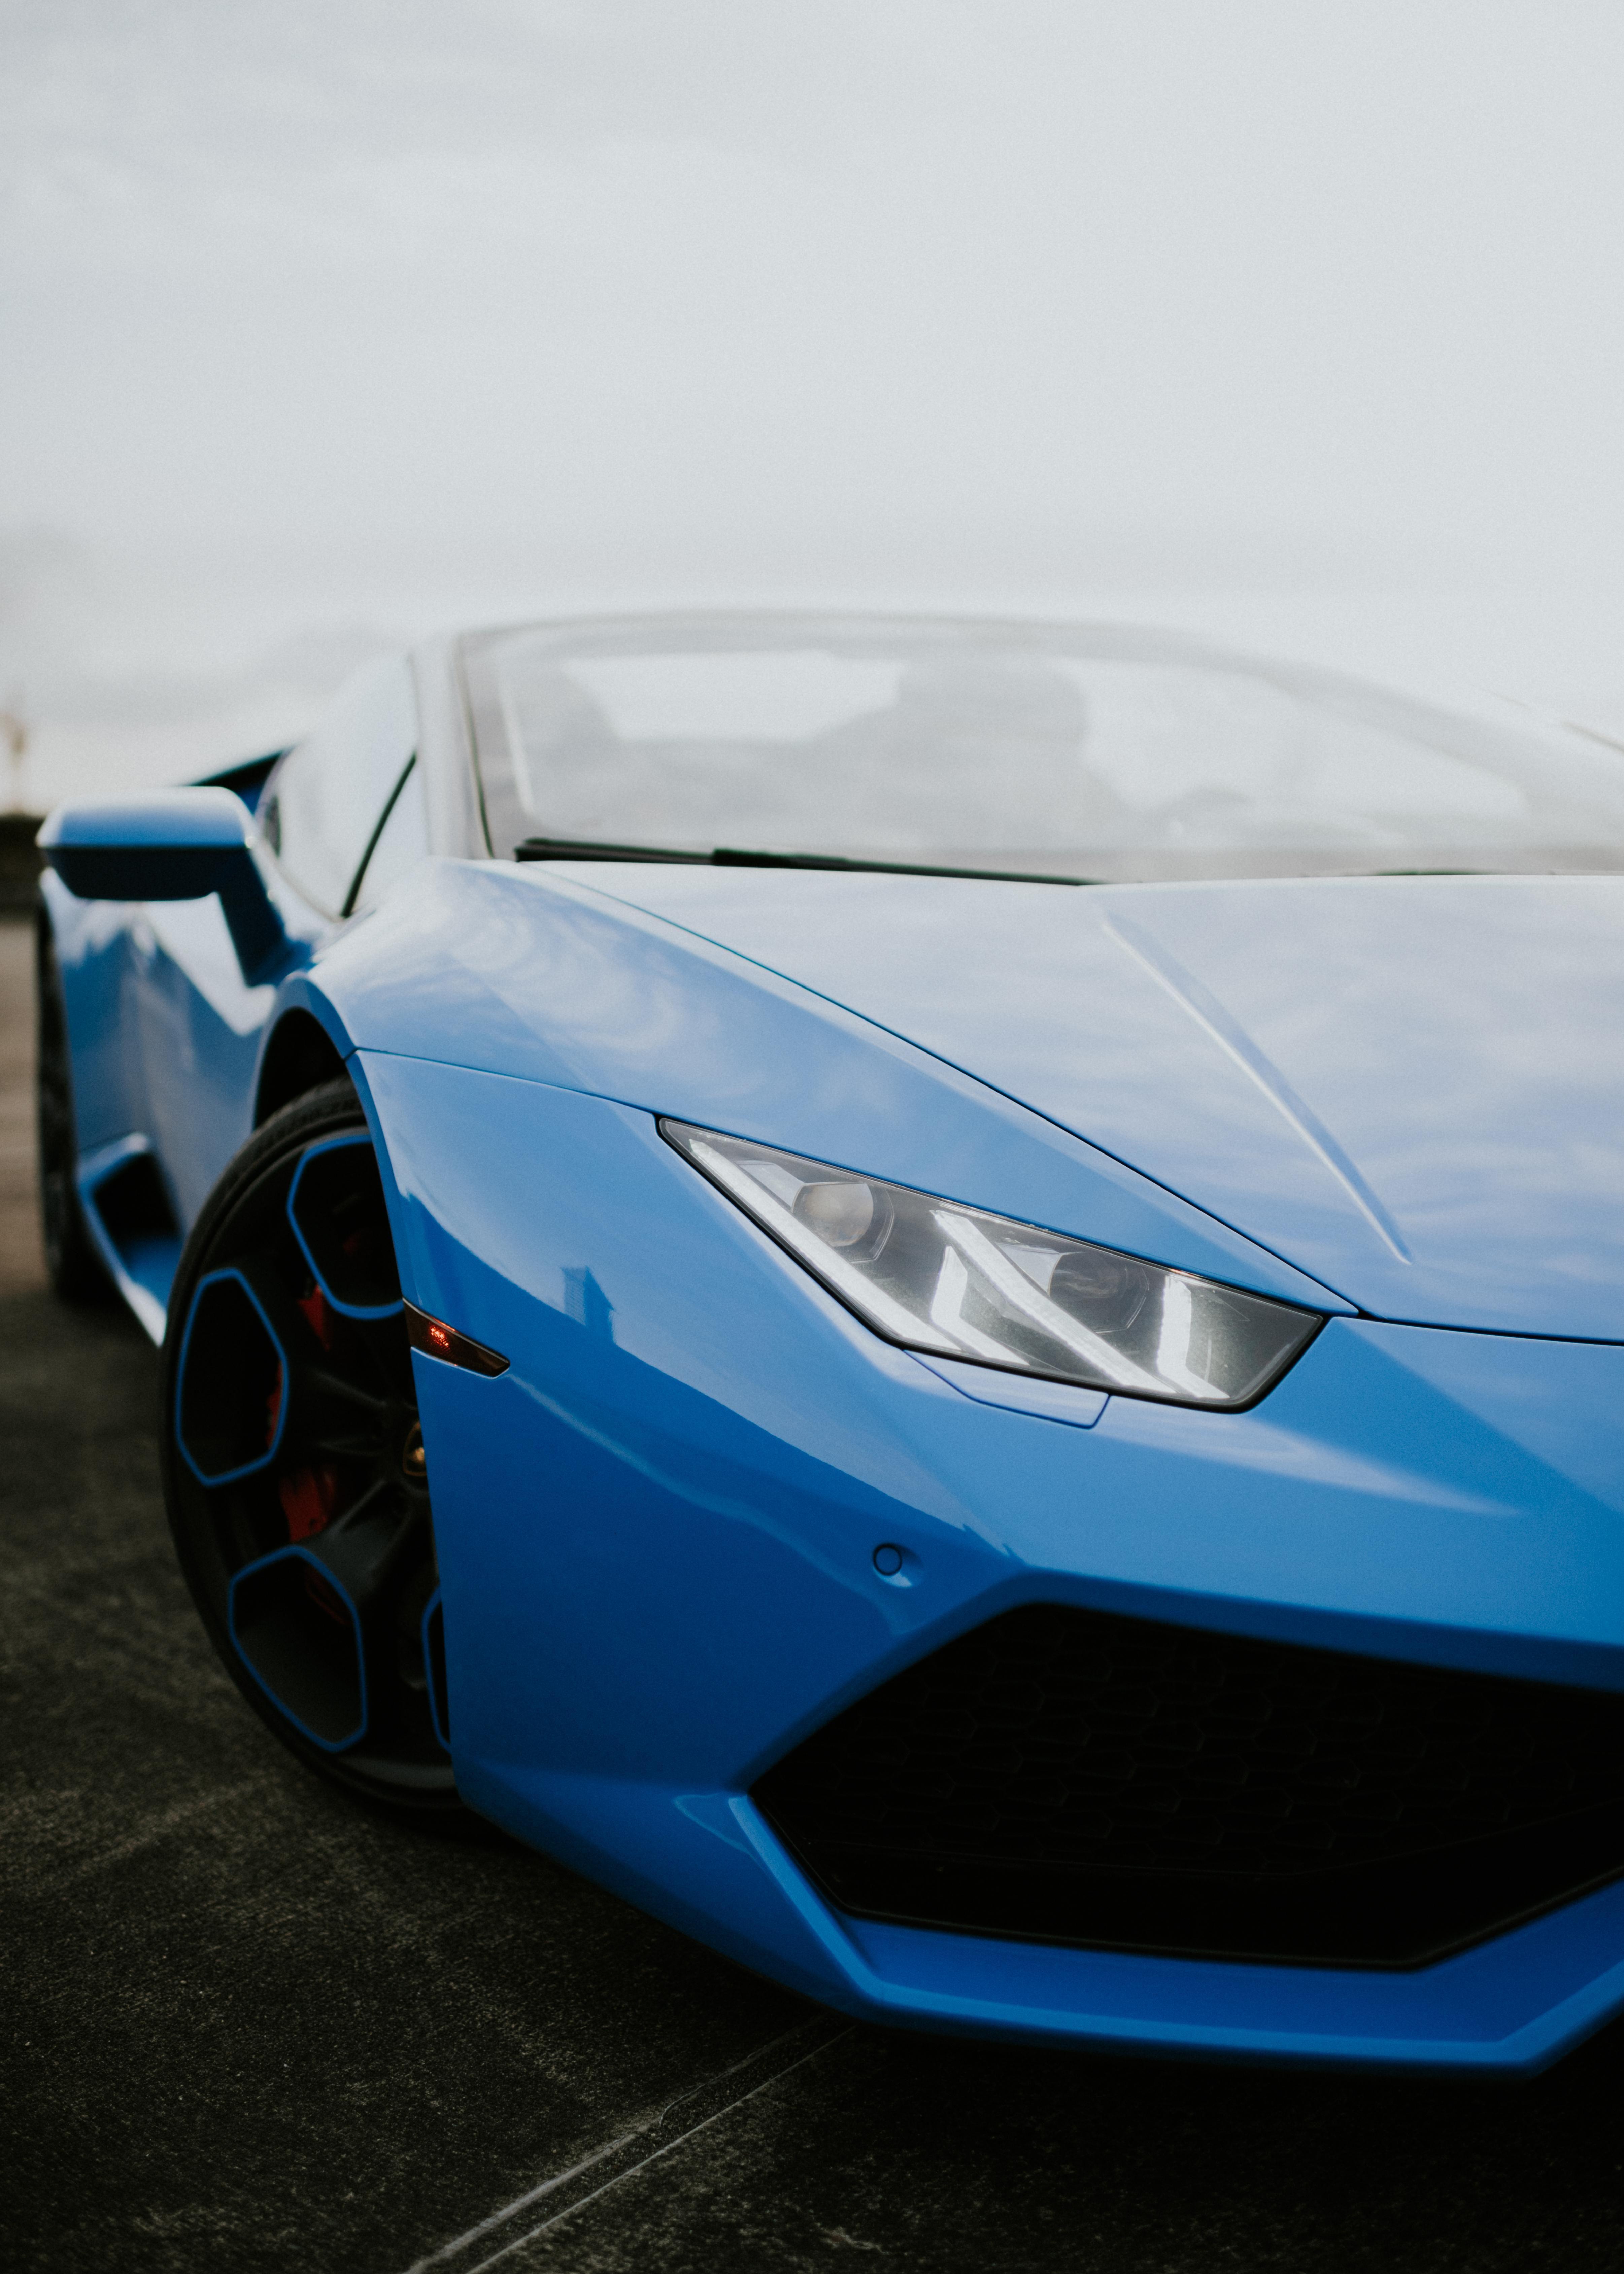 Eye Of The Tiger Or Bull Oc 4824 6754 Via Classy Bro Super Luxury Cars Luxury Cars Cool Cars